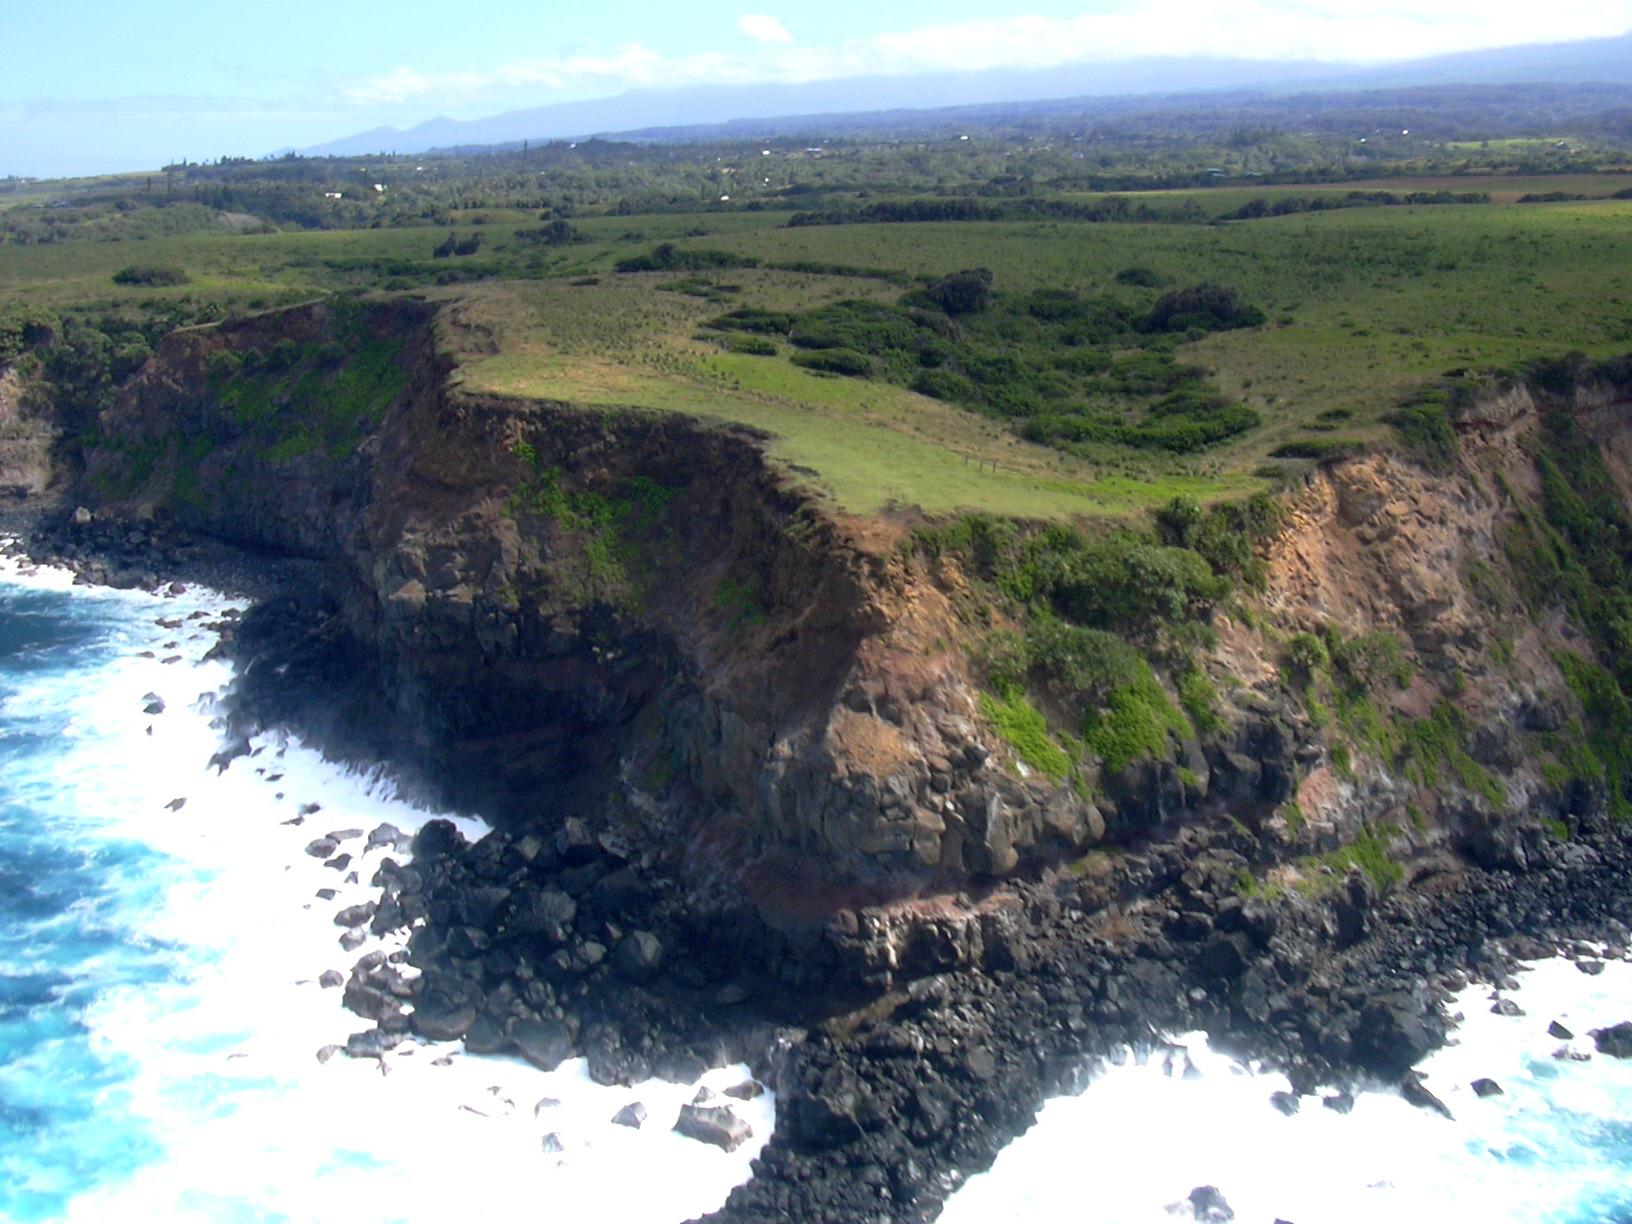 Haiku Aerial Cliffs courtesy of Forrest & Kim Starr